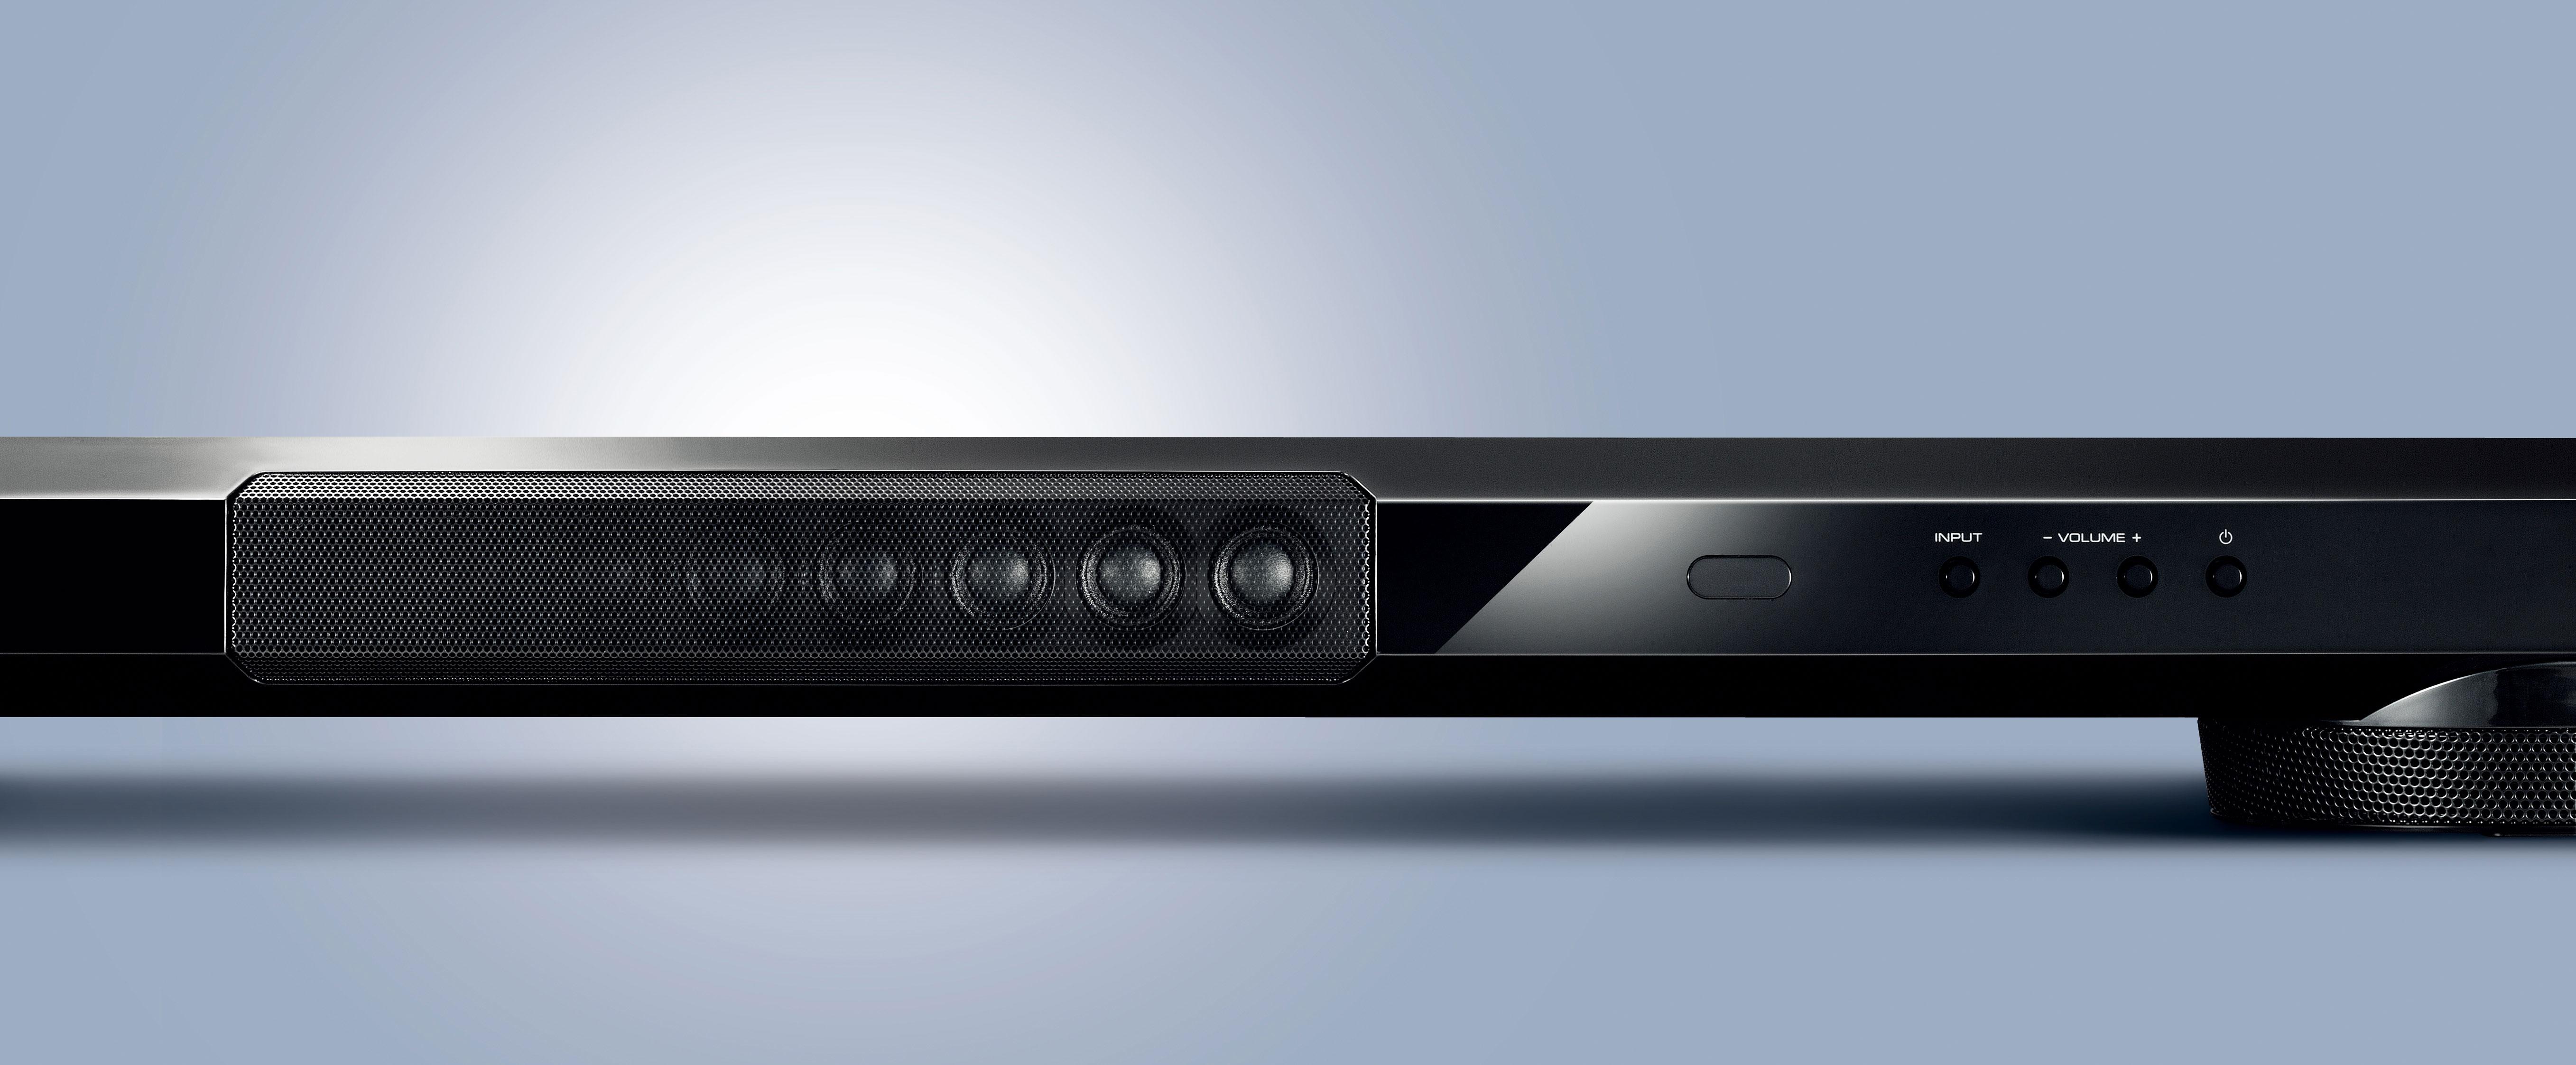 Yamaha ysp 1400 digital sound projector sound bar built in for Yamaha ysp 1400 app